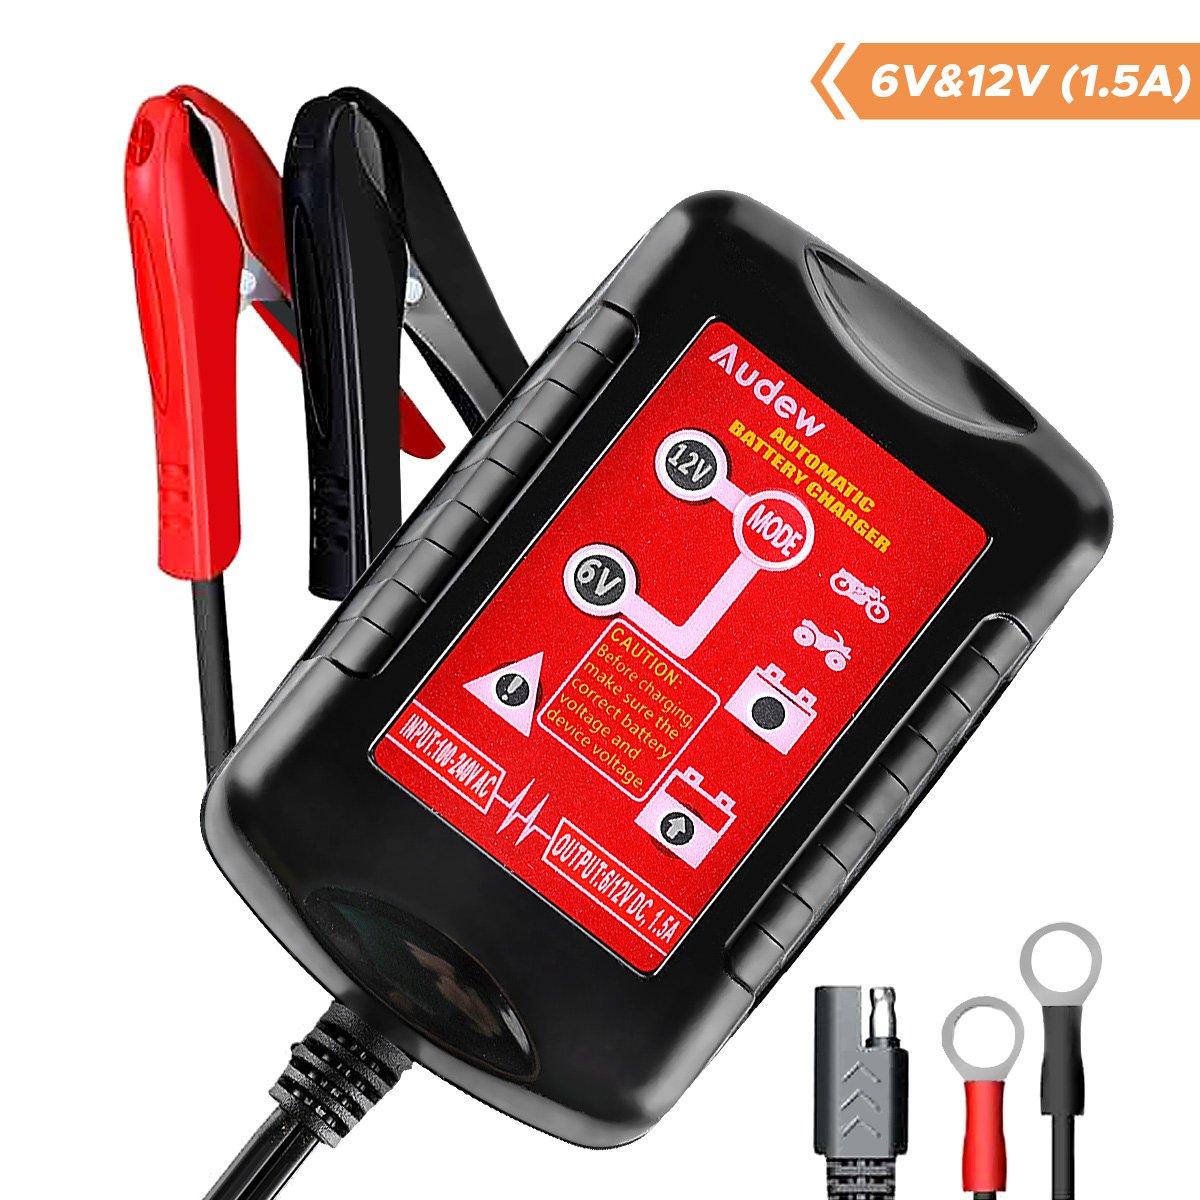 Audew Automatik-Ladegerät Ladegerät KFZ Batterieladegerät Vollautomatisches Ladegerät 6V 12V Ideal für PKW Motorrad Roller oder Boot/Inkl. Polklemmen – EU Stecker